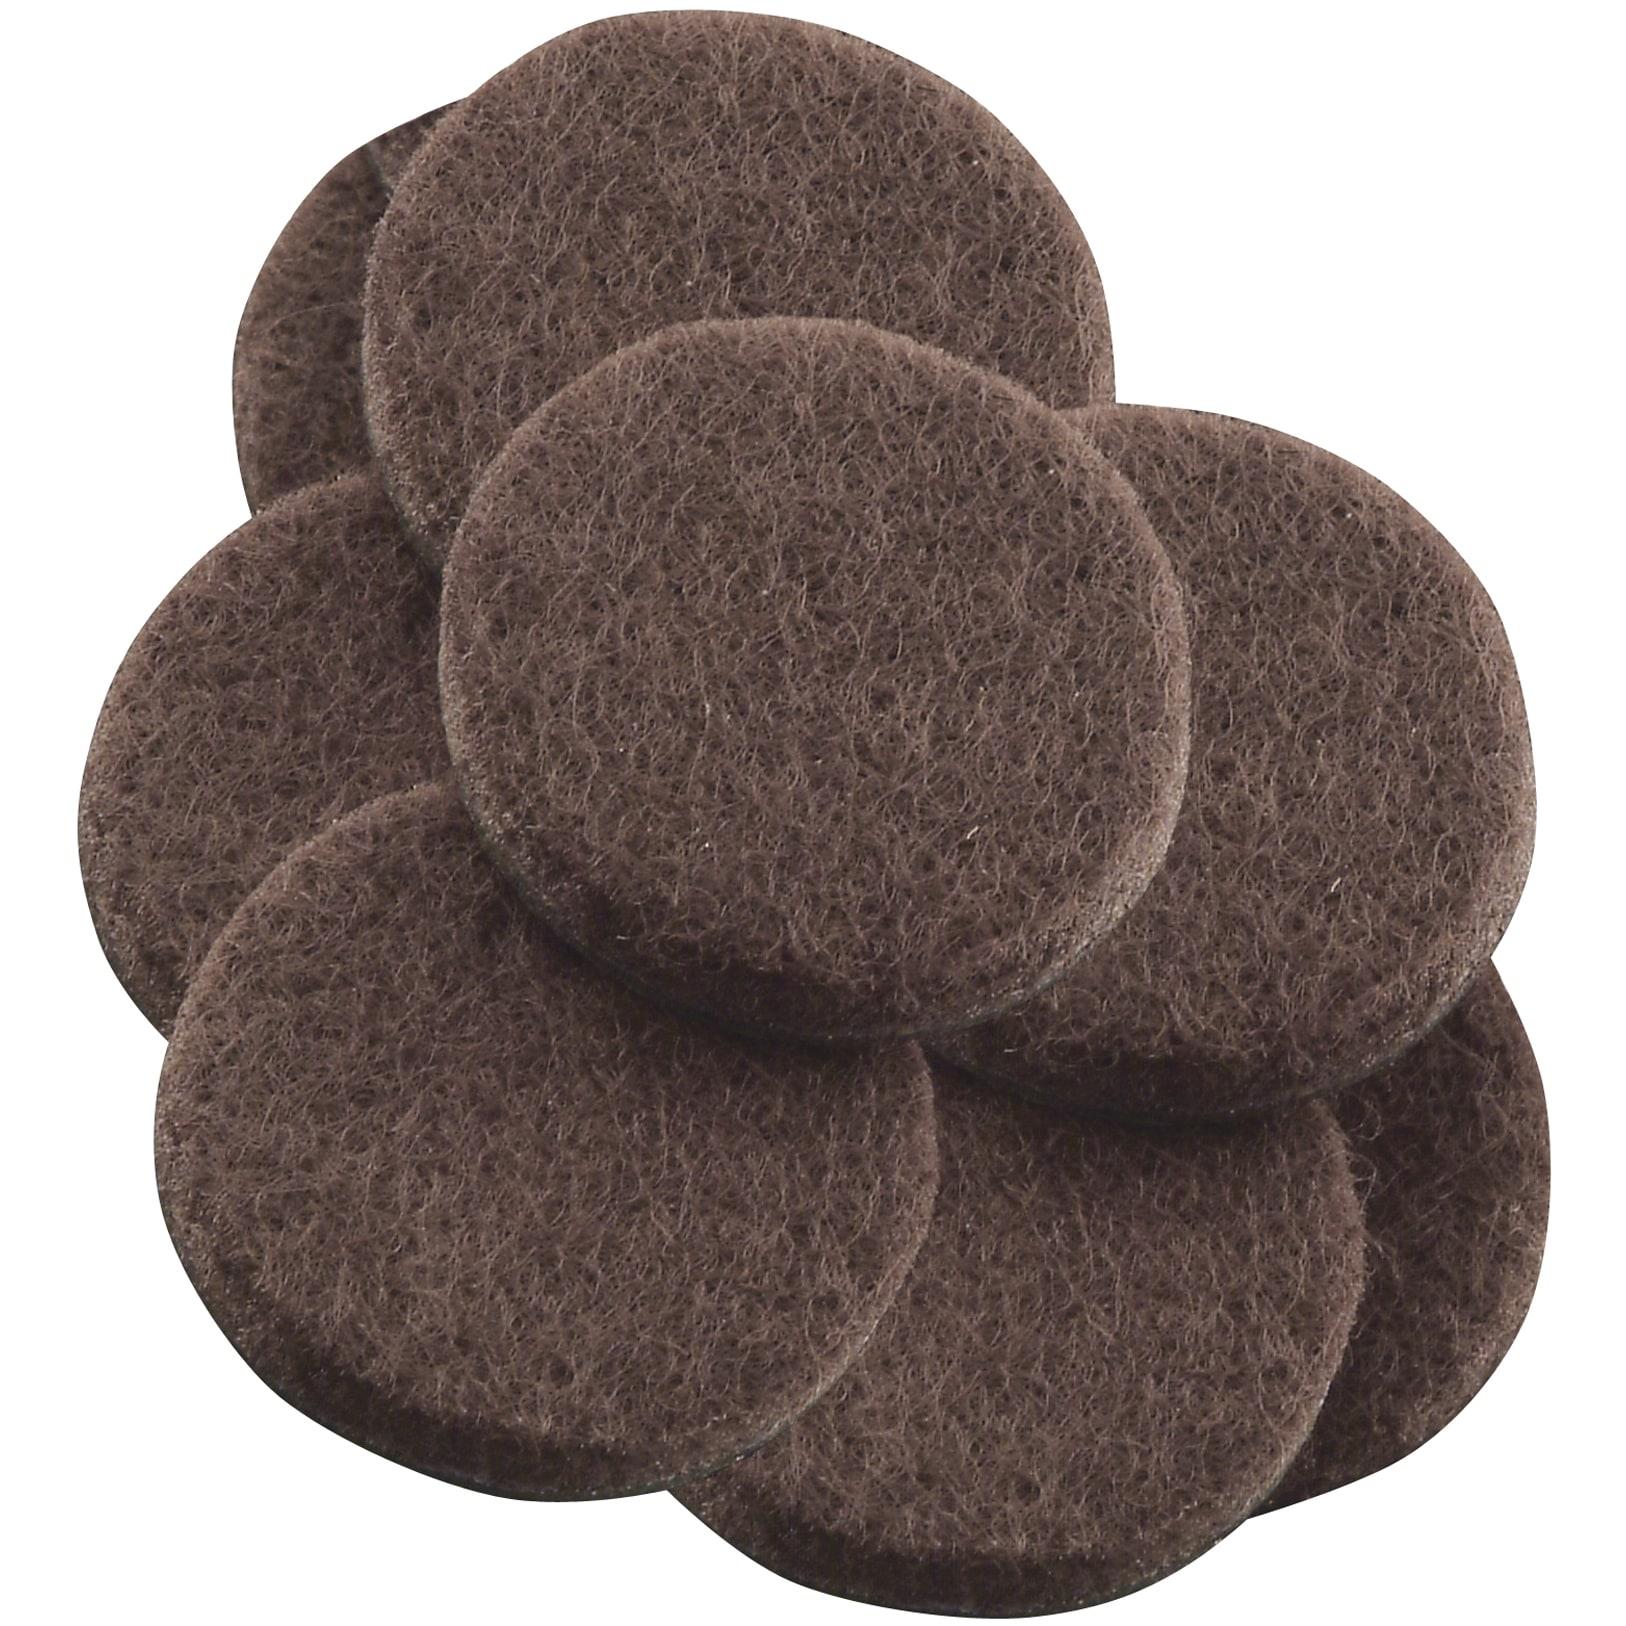 Waxman felt pads